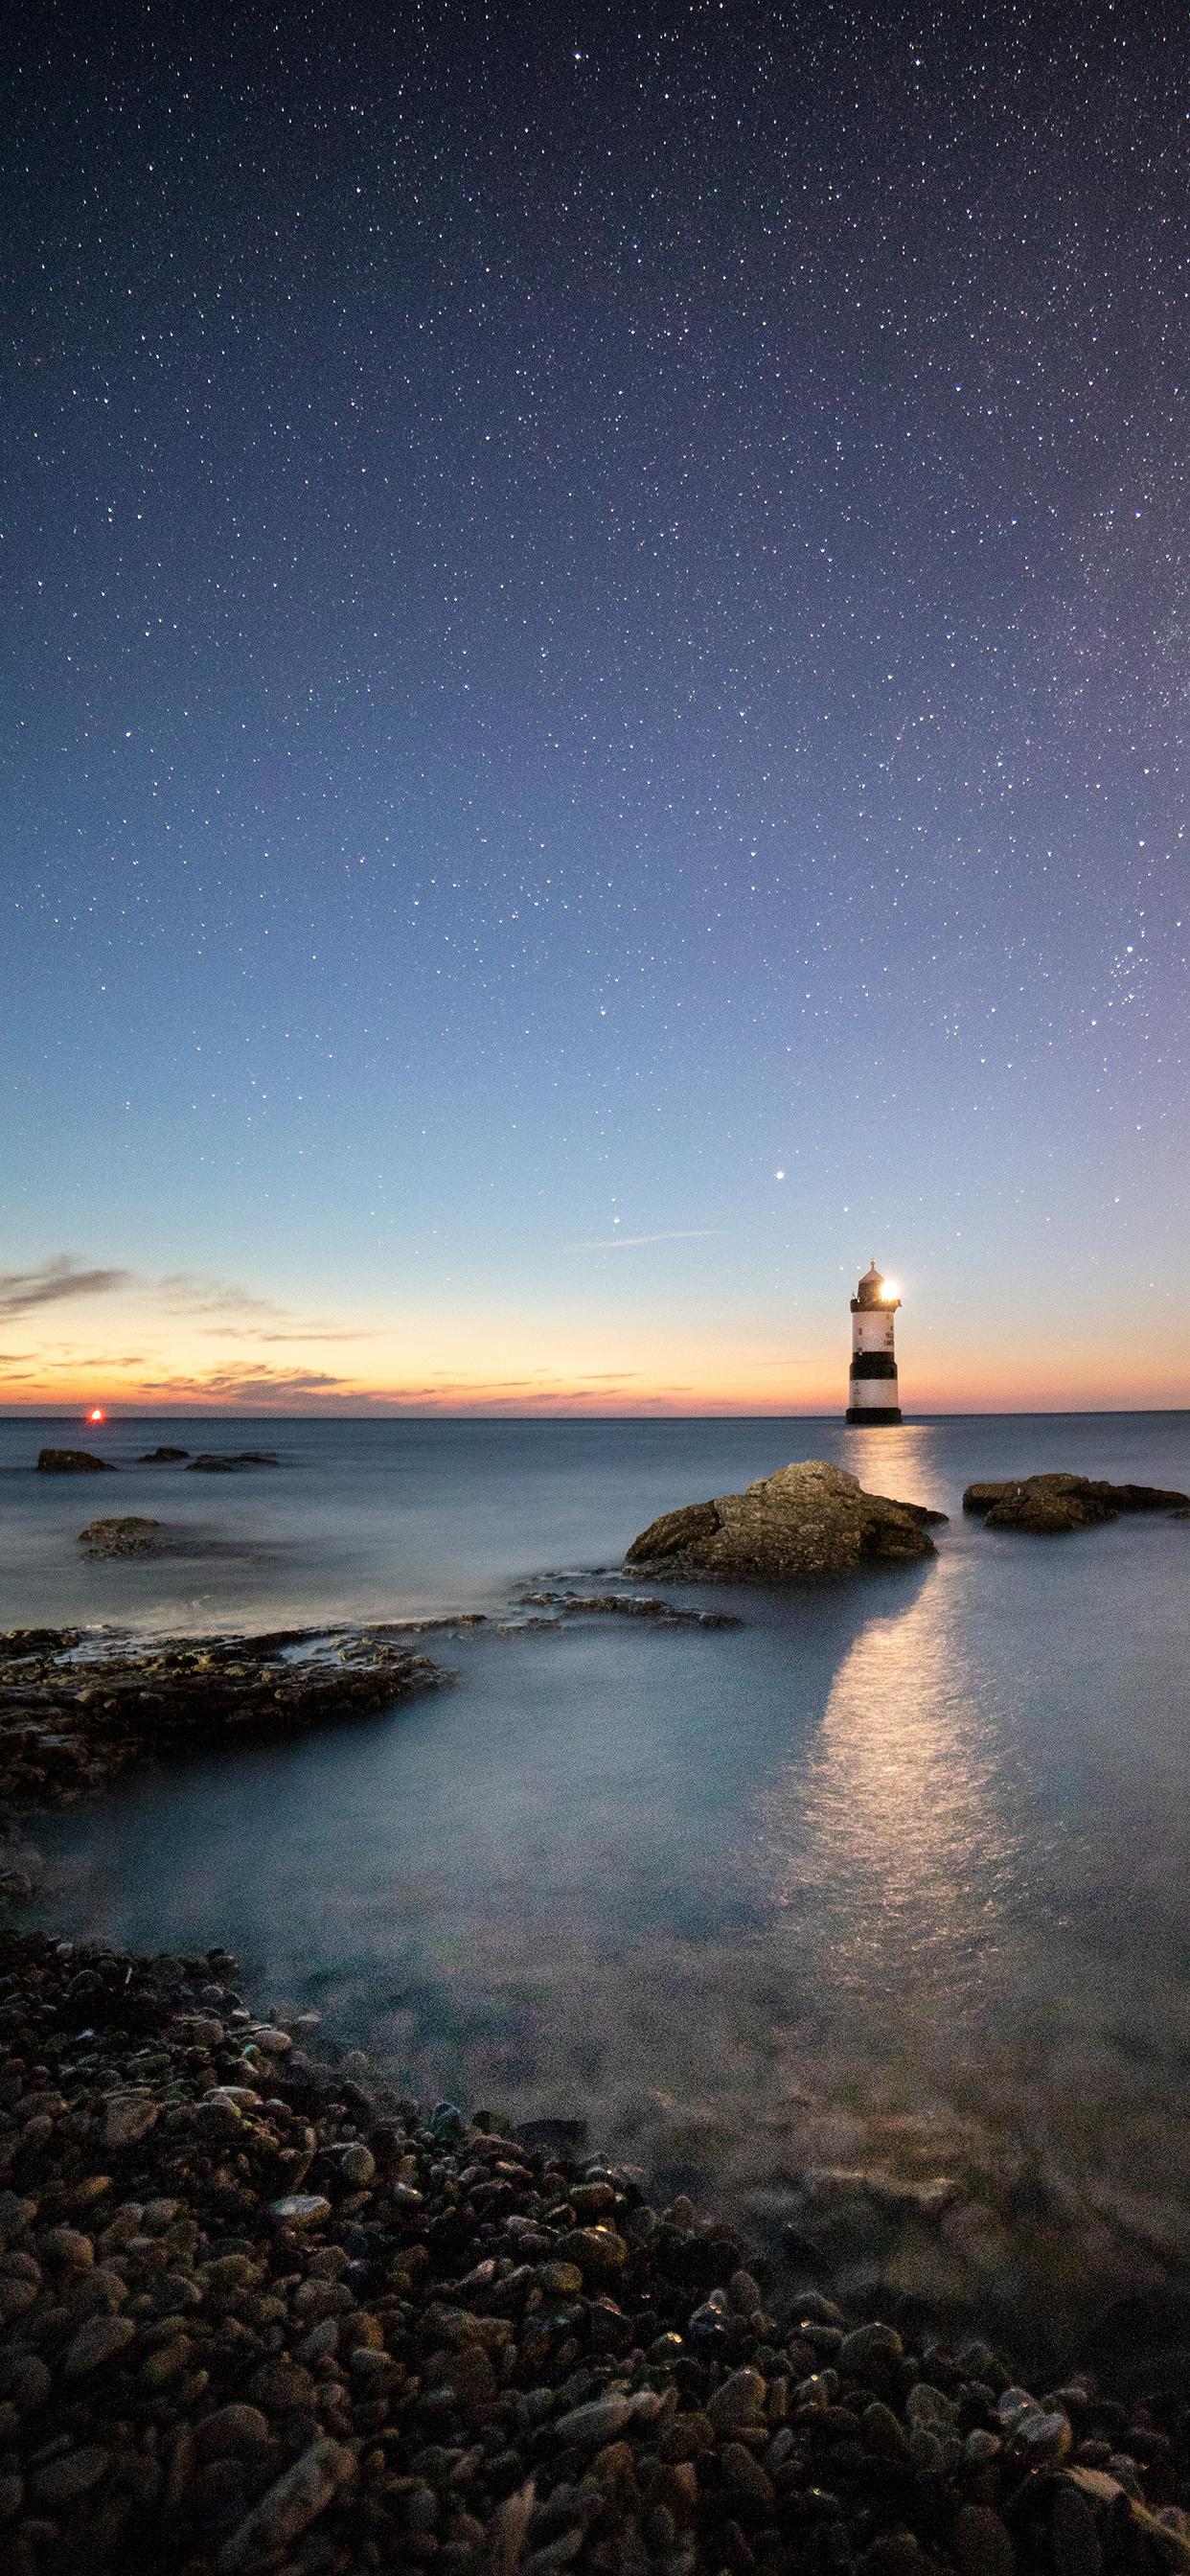 iPhone wallpaper lighthouse united kingdom Lighthouse